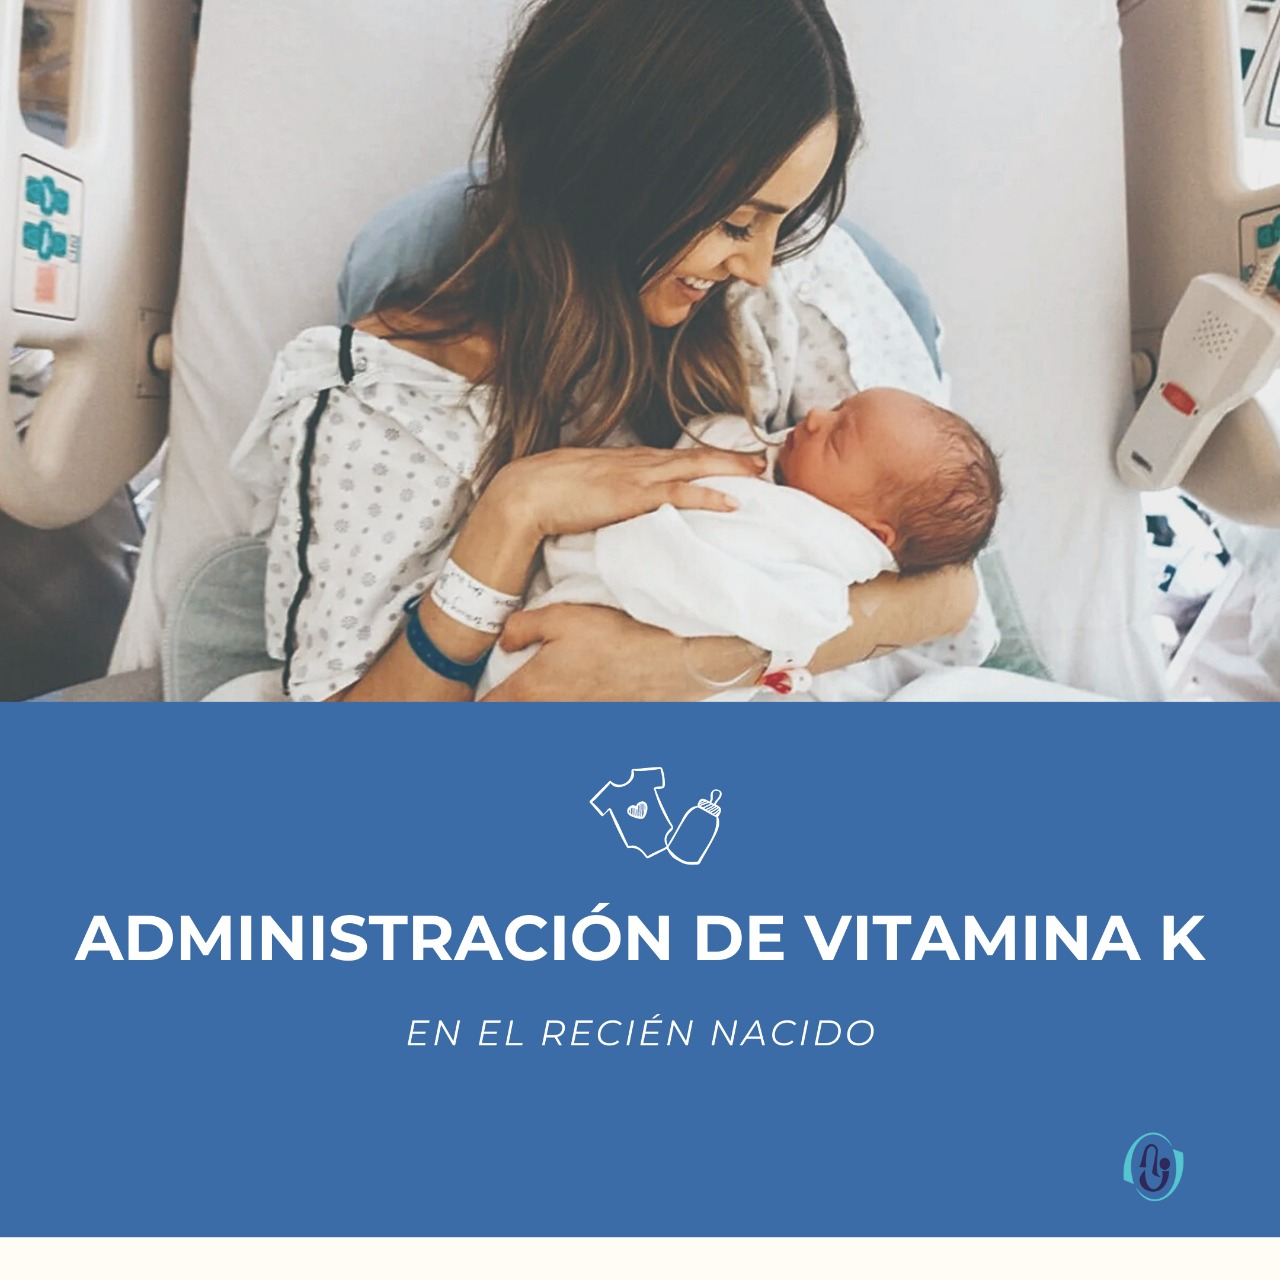 Administración de Vitamina K